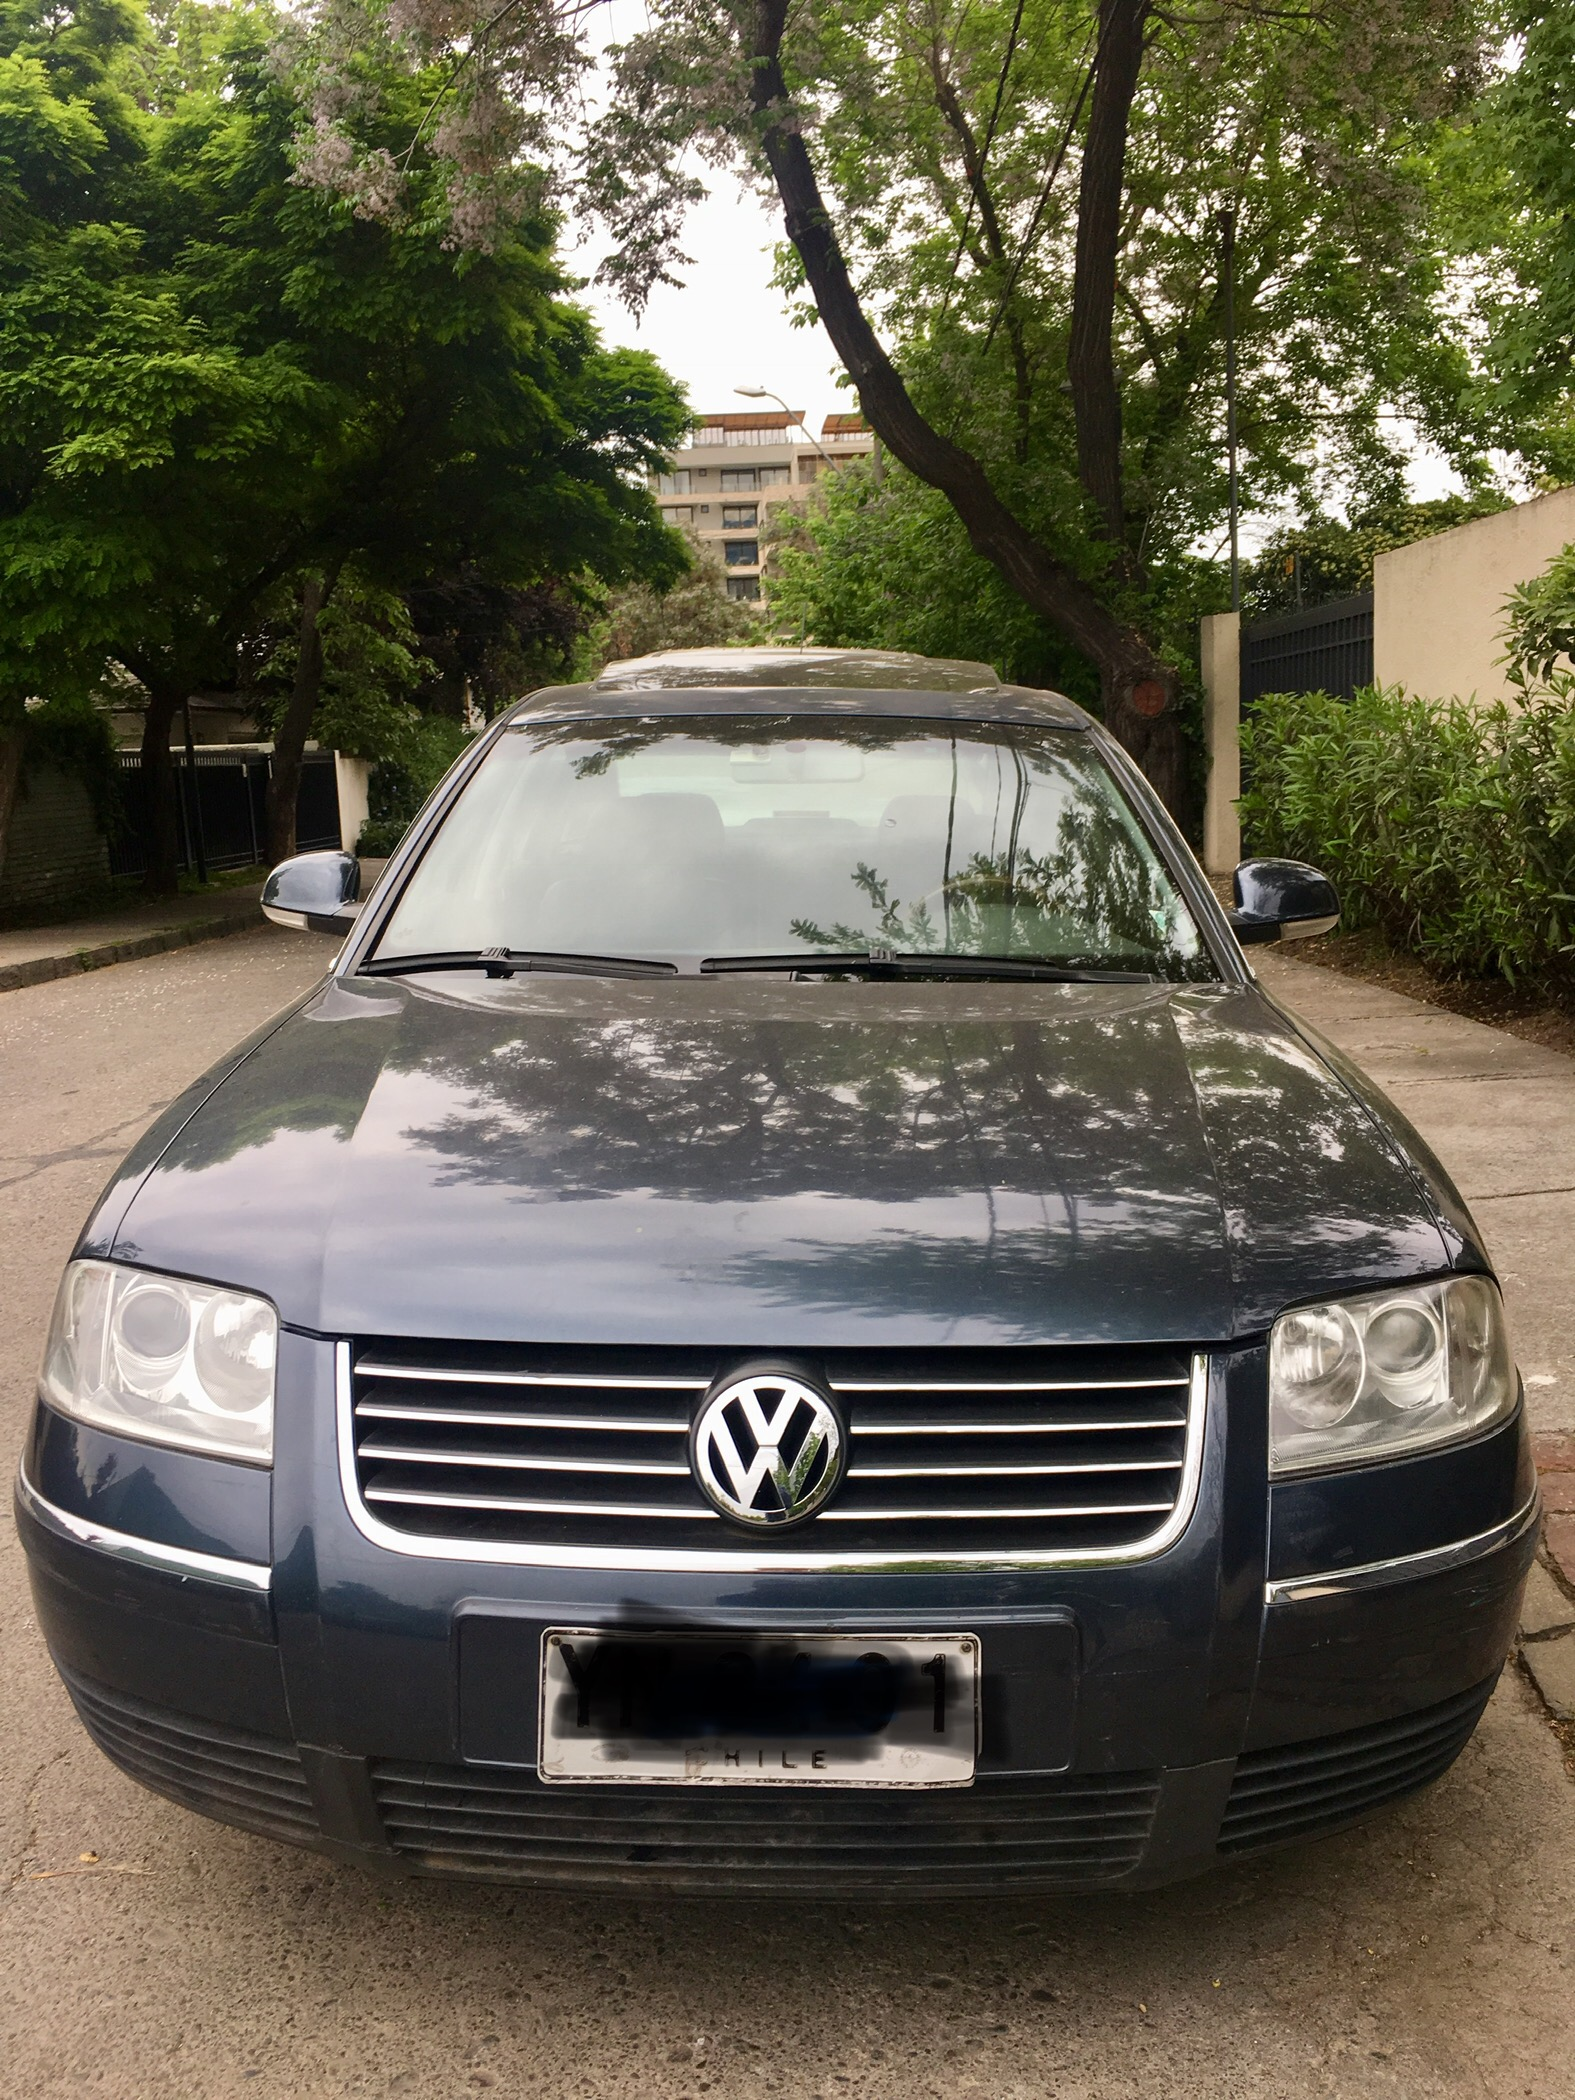 Volkswagen Passat 1.8T Highline (turbo) año 2005